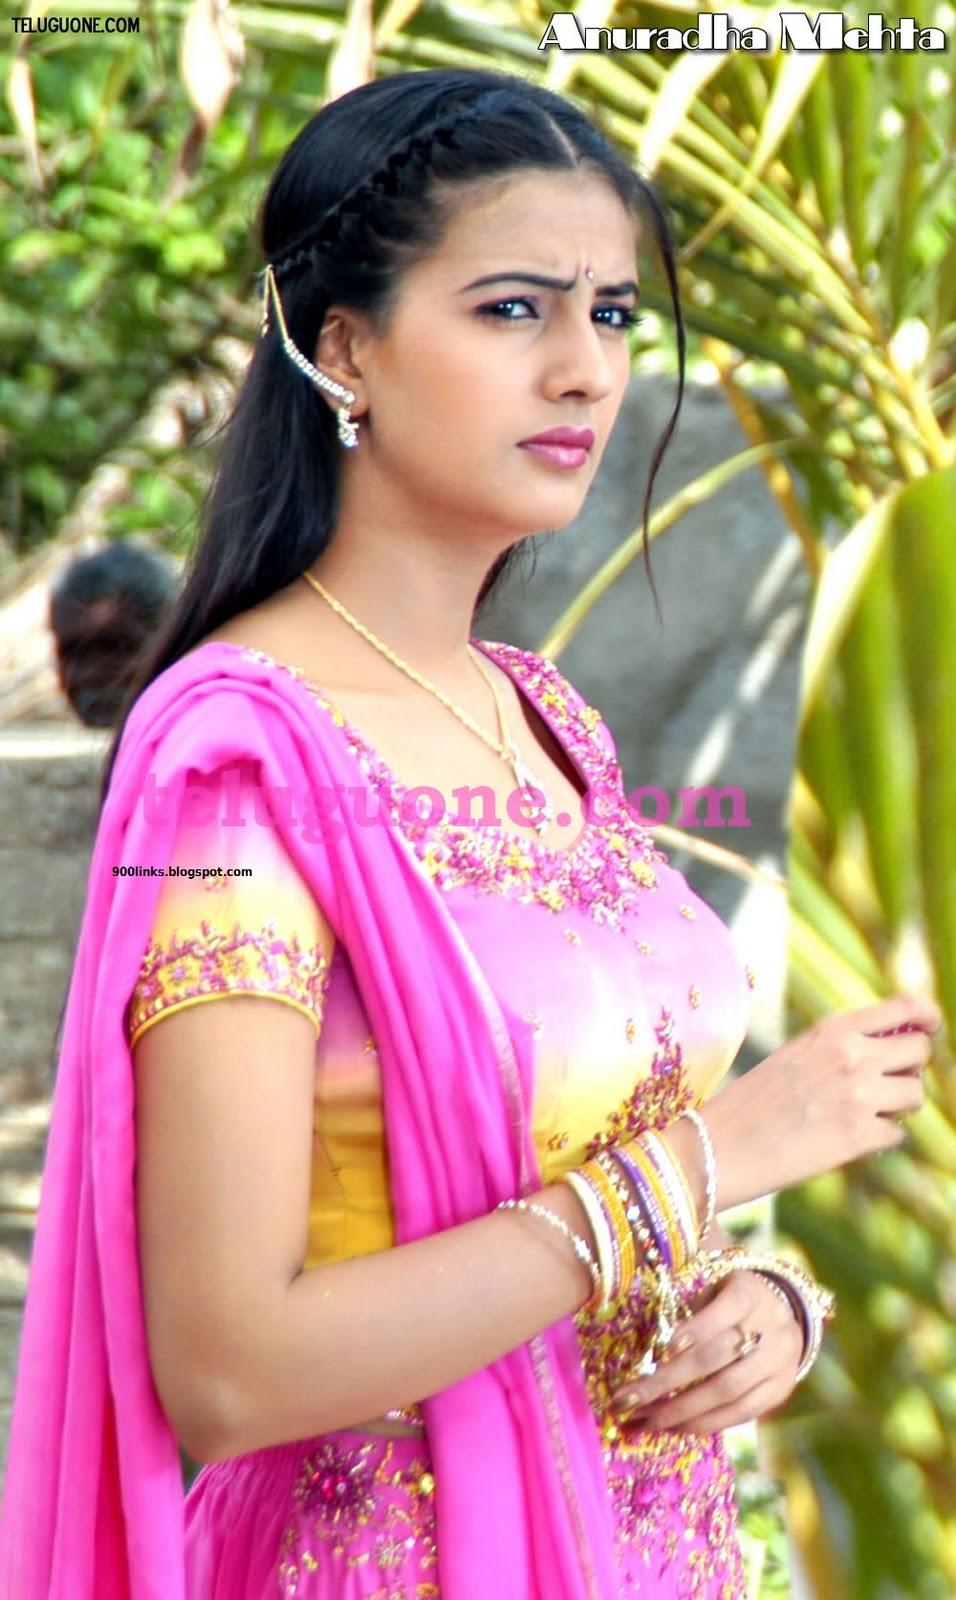 pictures Anuradha Mehta